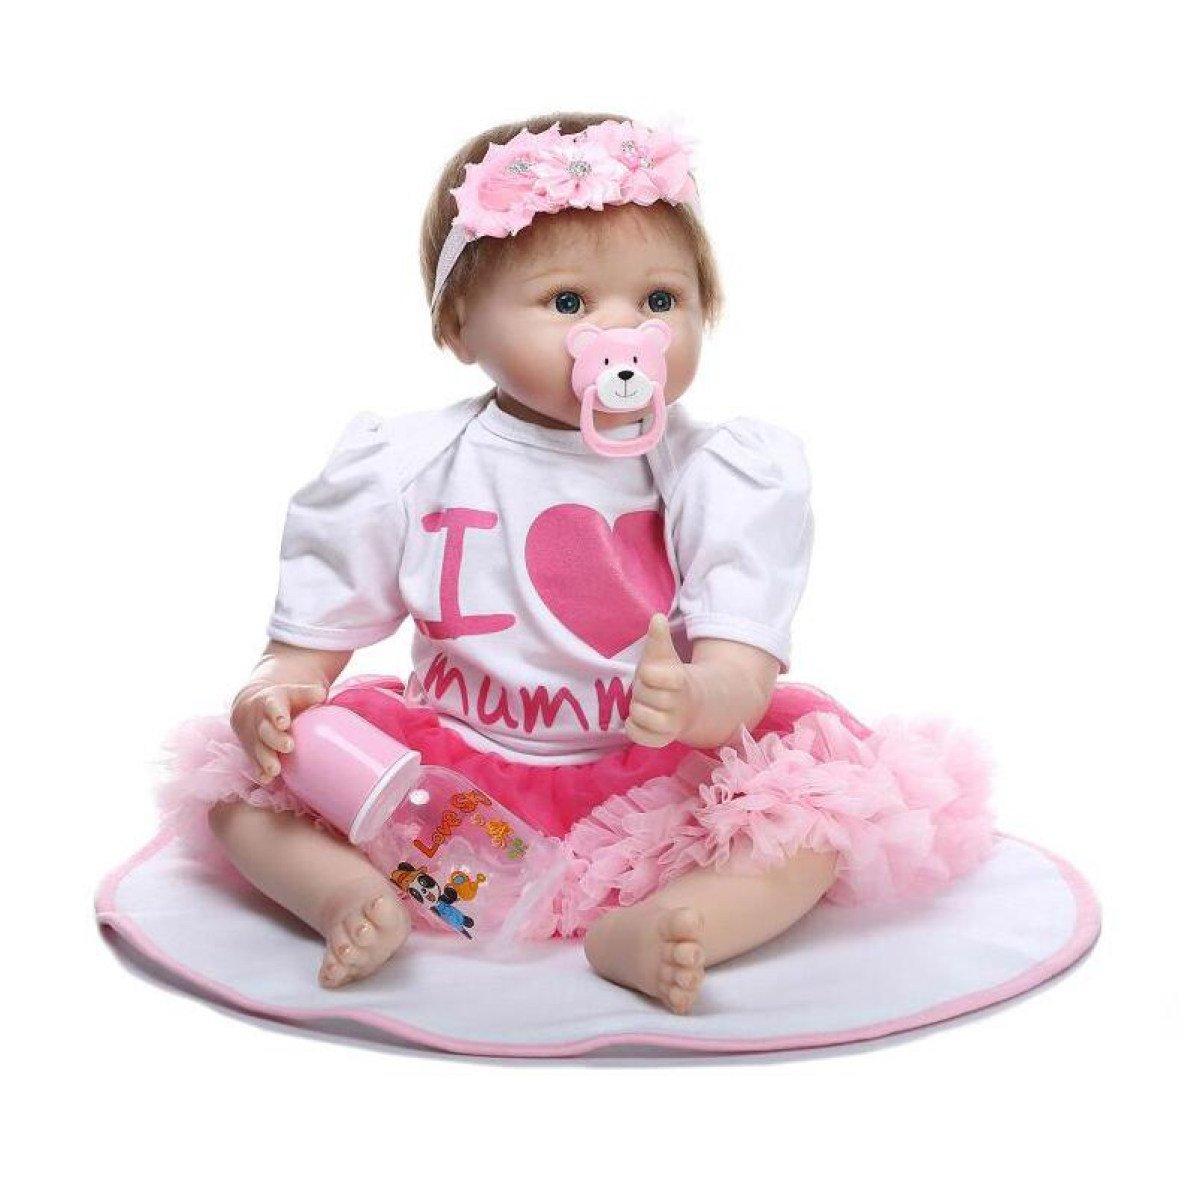 Yihangシリコンビニール人形Eyes Open Boy 22インチRebornボディ磁気口フルAlive Baby Realビニールベリーキッズおもちゃ子供誕生日ギフト   B07BP2G6YM